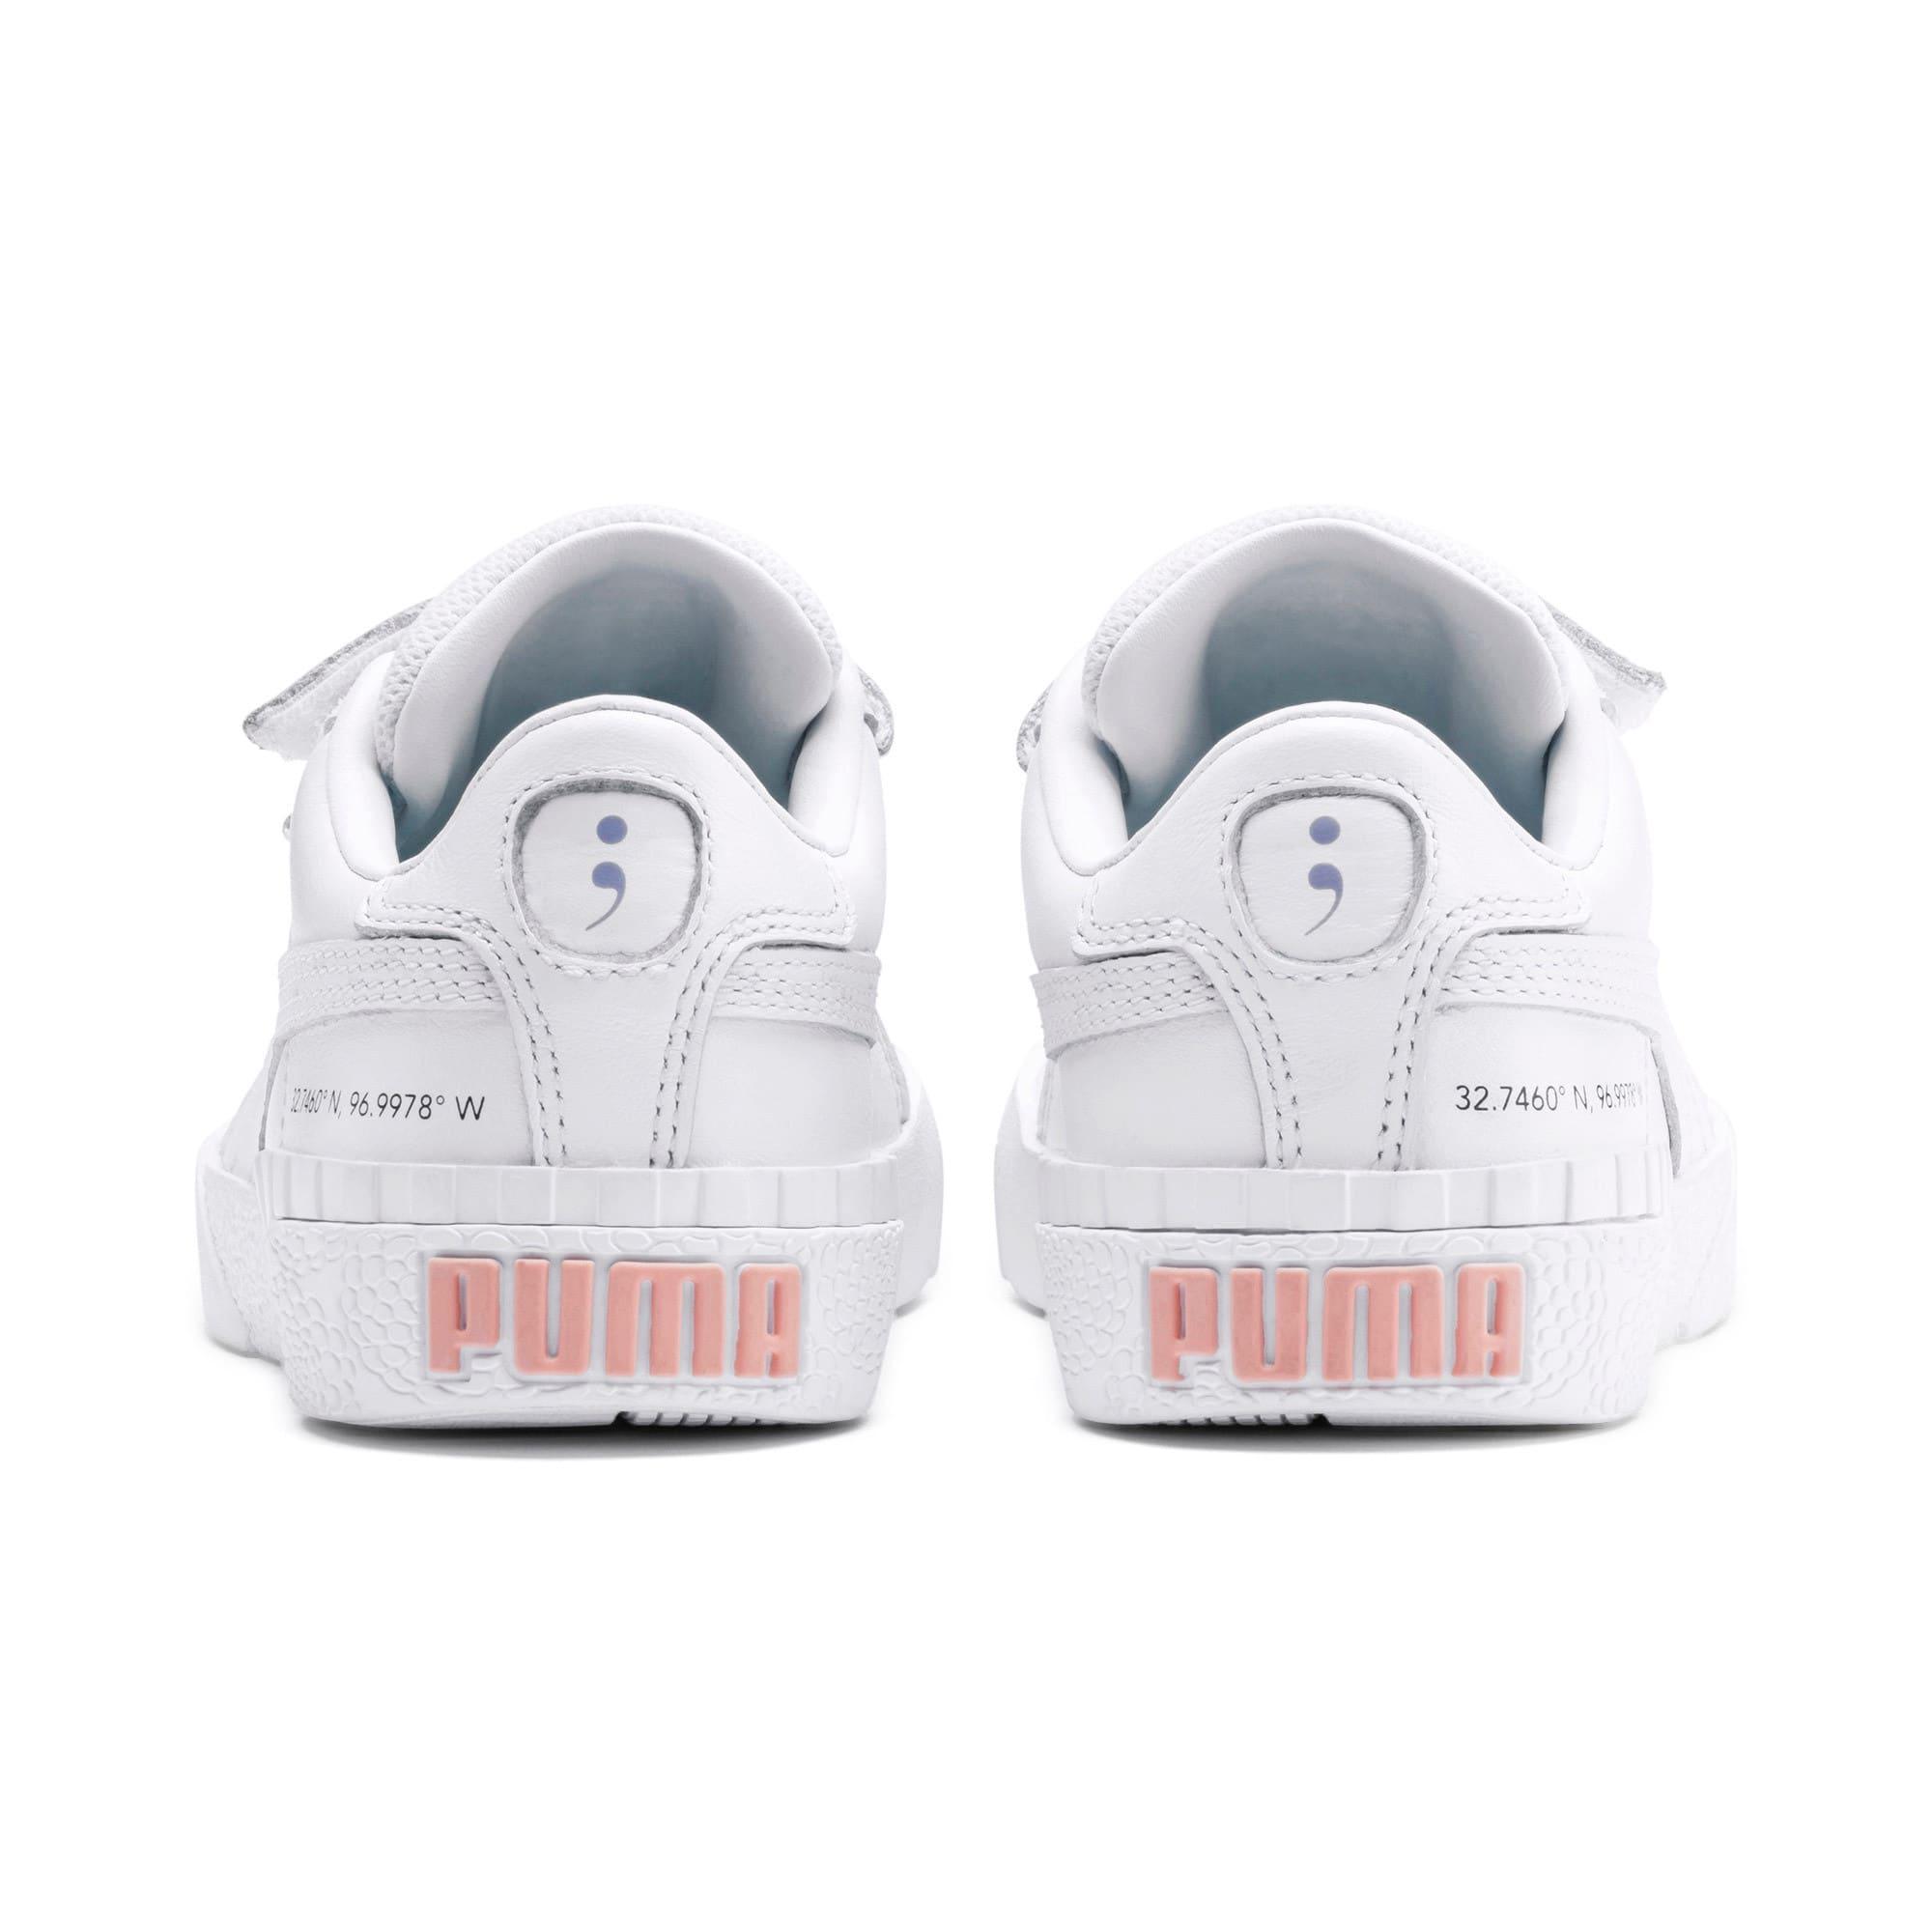 Imagen en miniatura 3 de Zapatillas de niño Cali PUMA x SELENA GOMEZ, Puma White-Puma White, mediana